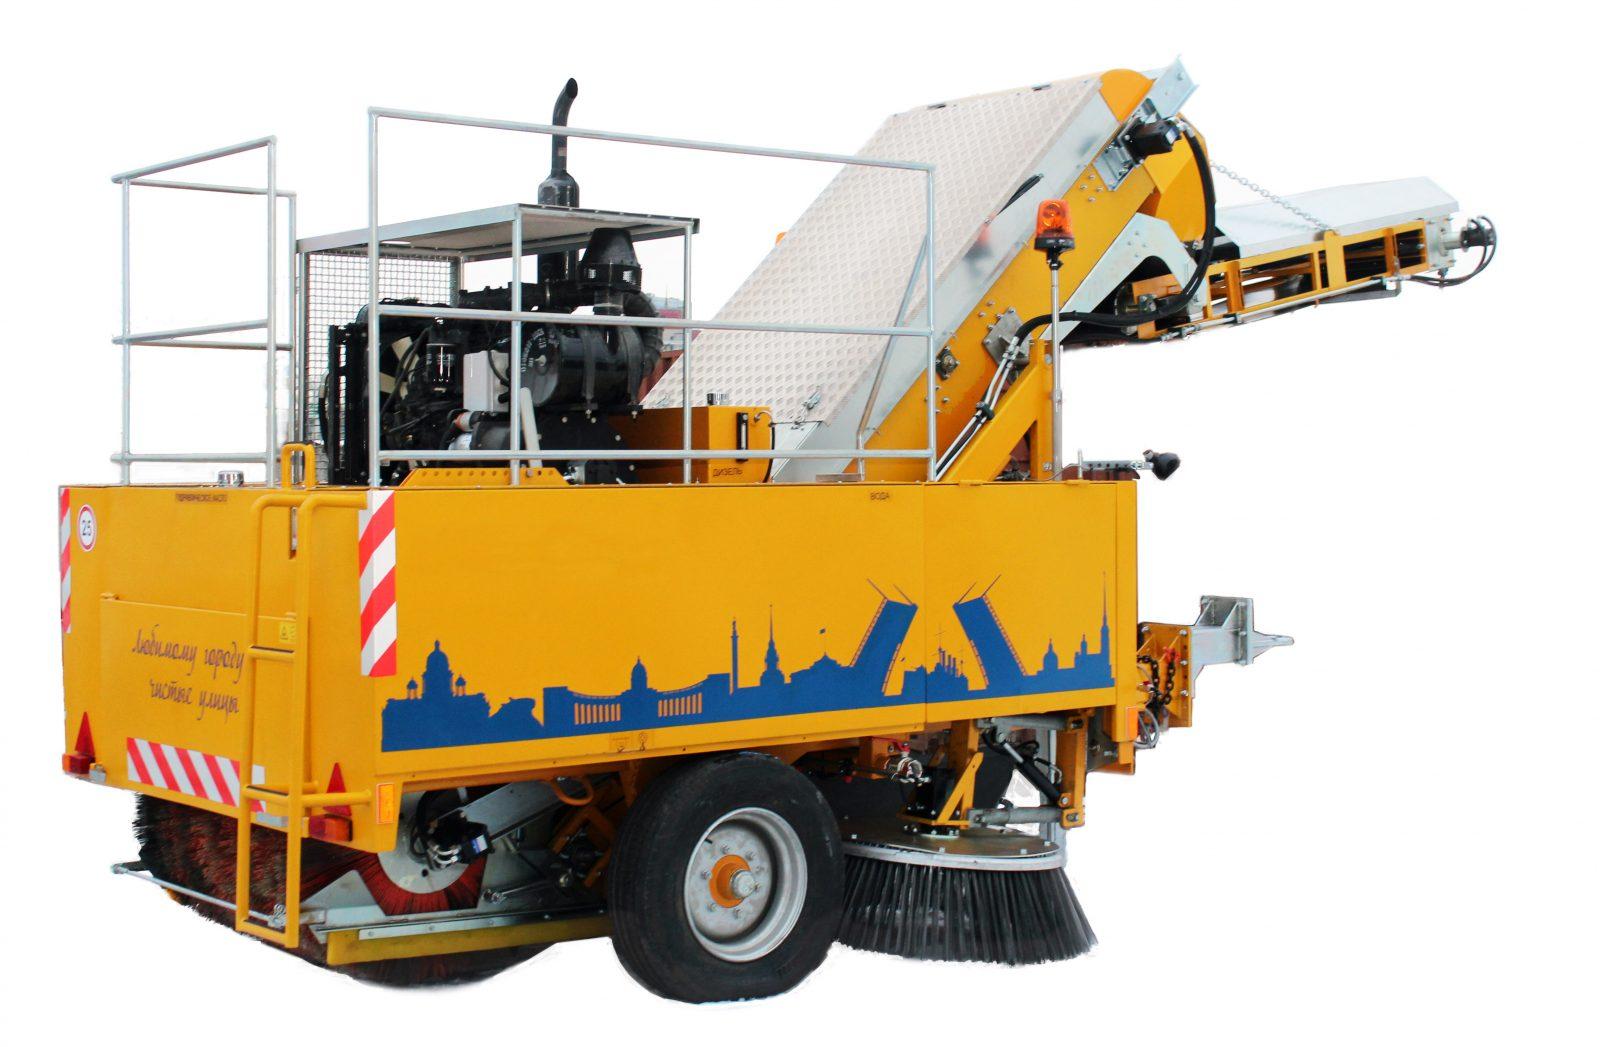 Trailed sweeper machine BRODDWAY